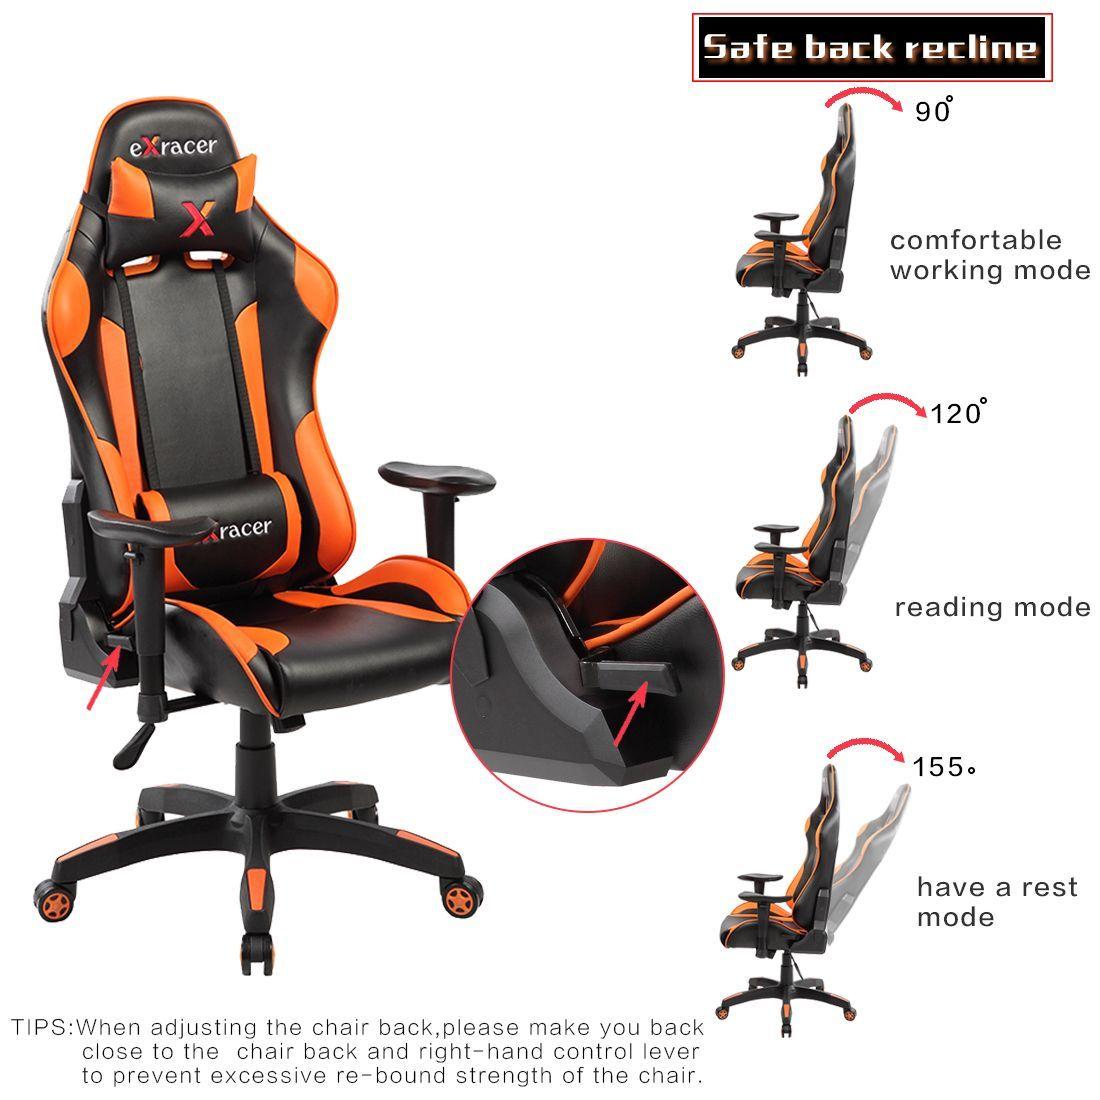 autofull bunny chair discount code